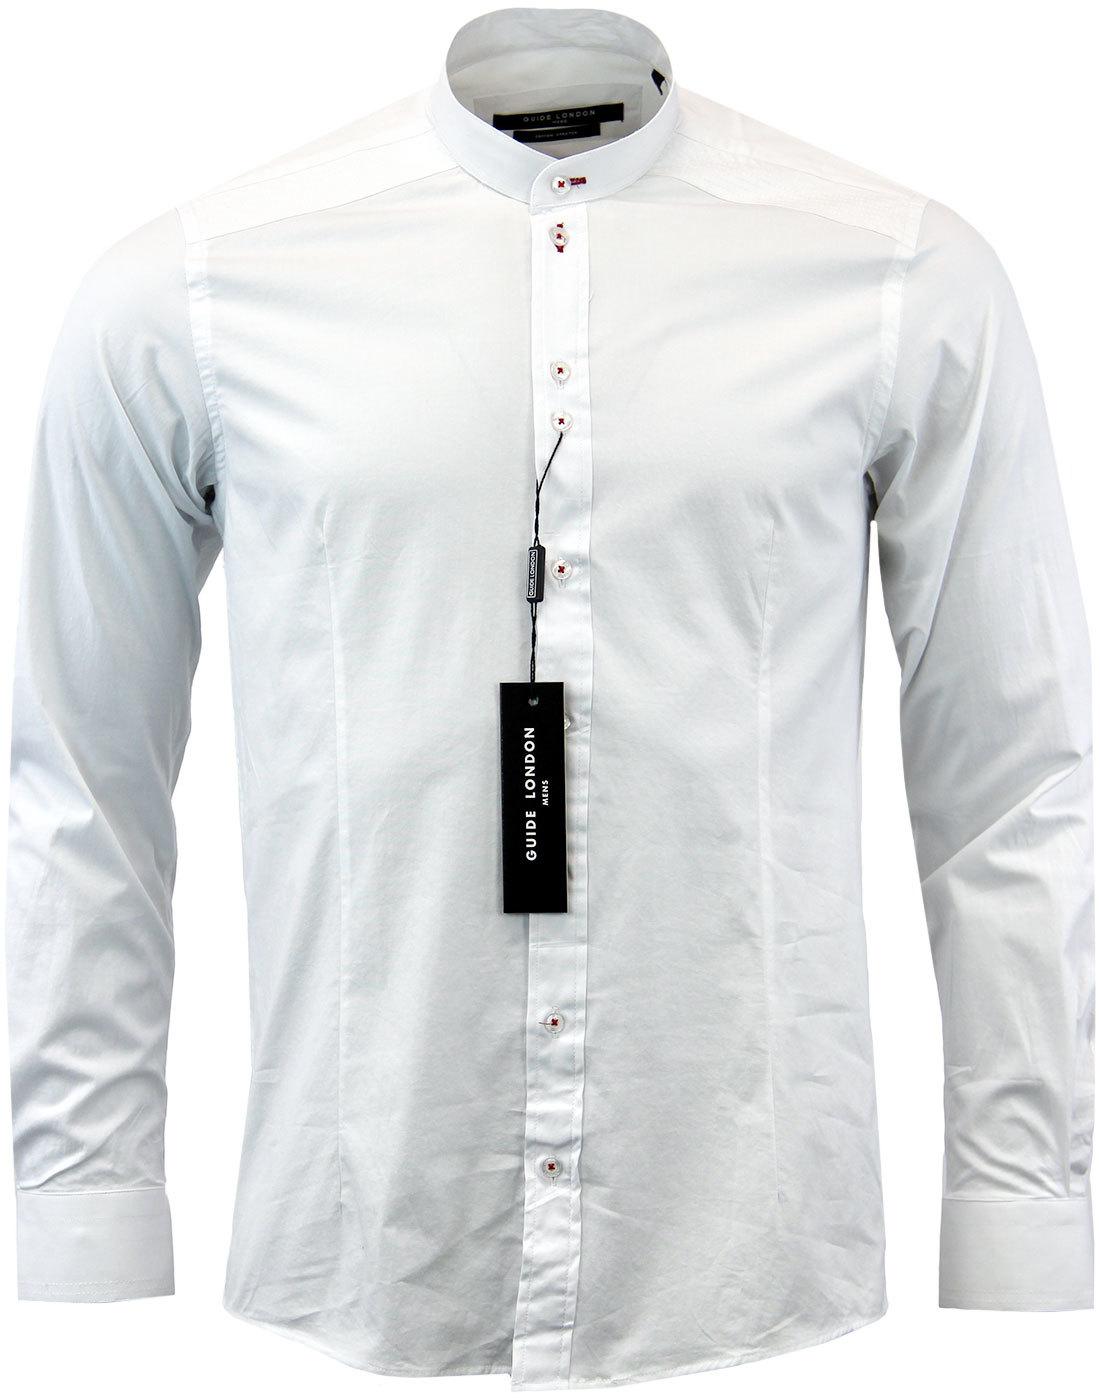 GUIDE LONDON 60s Mod Smart Grandad Shirt WHITE